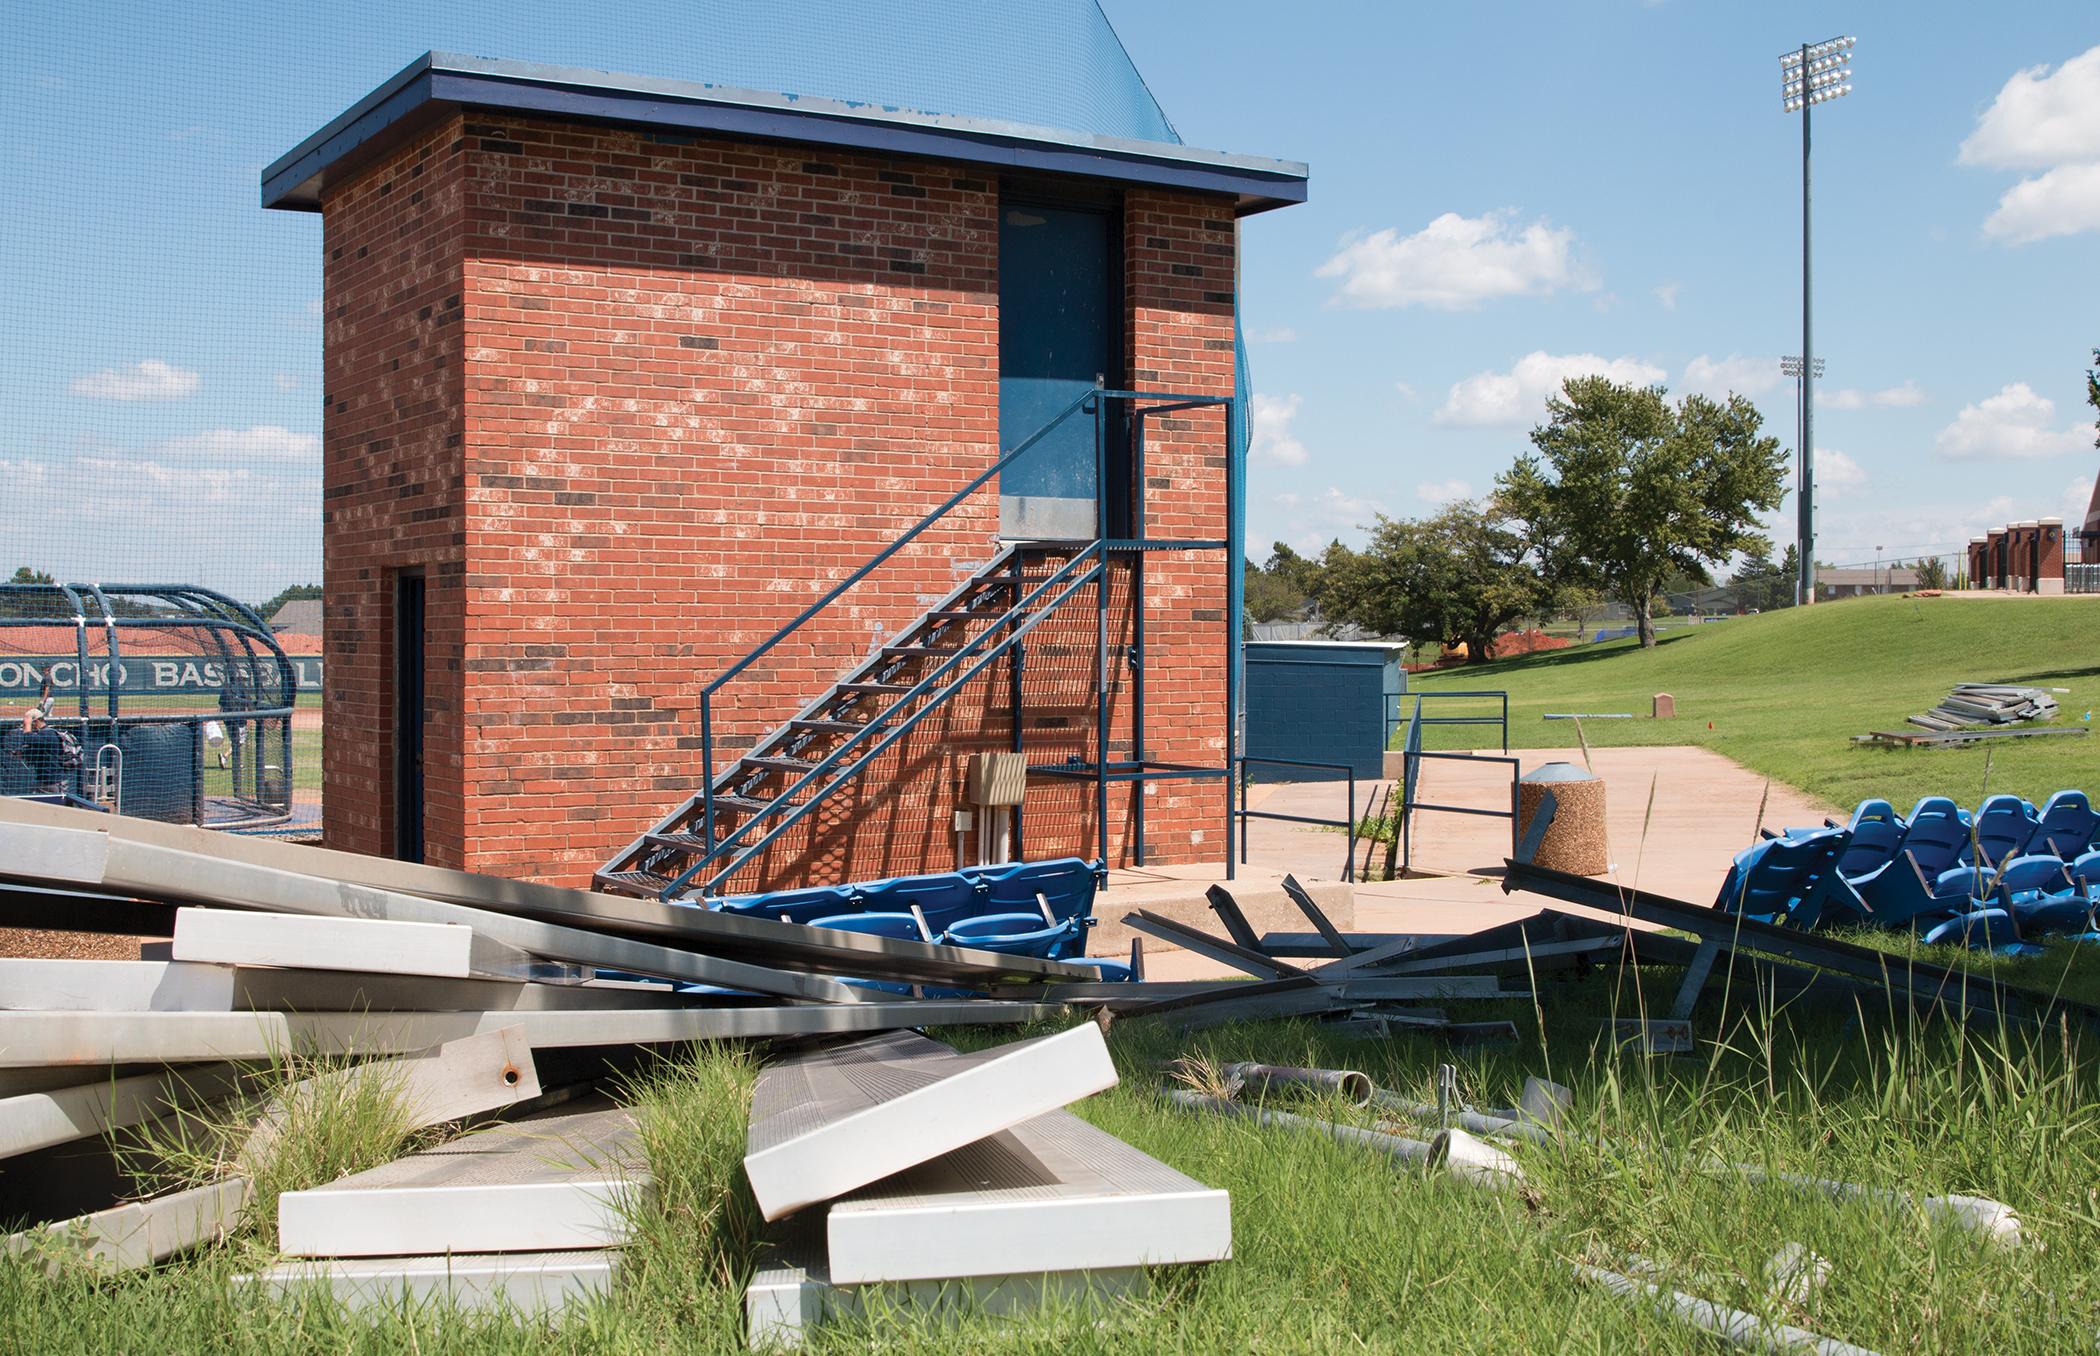 Baseball Donation Falls Apart: University Not Alone in Endowment Falling Through